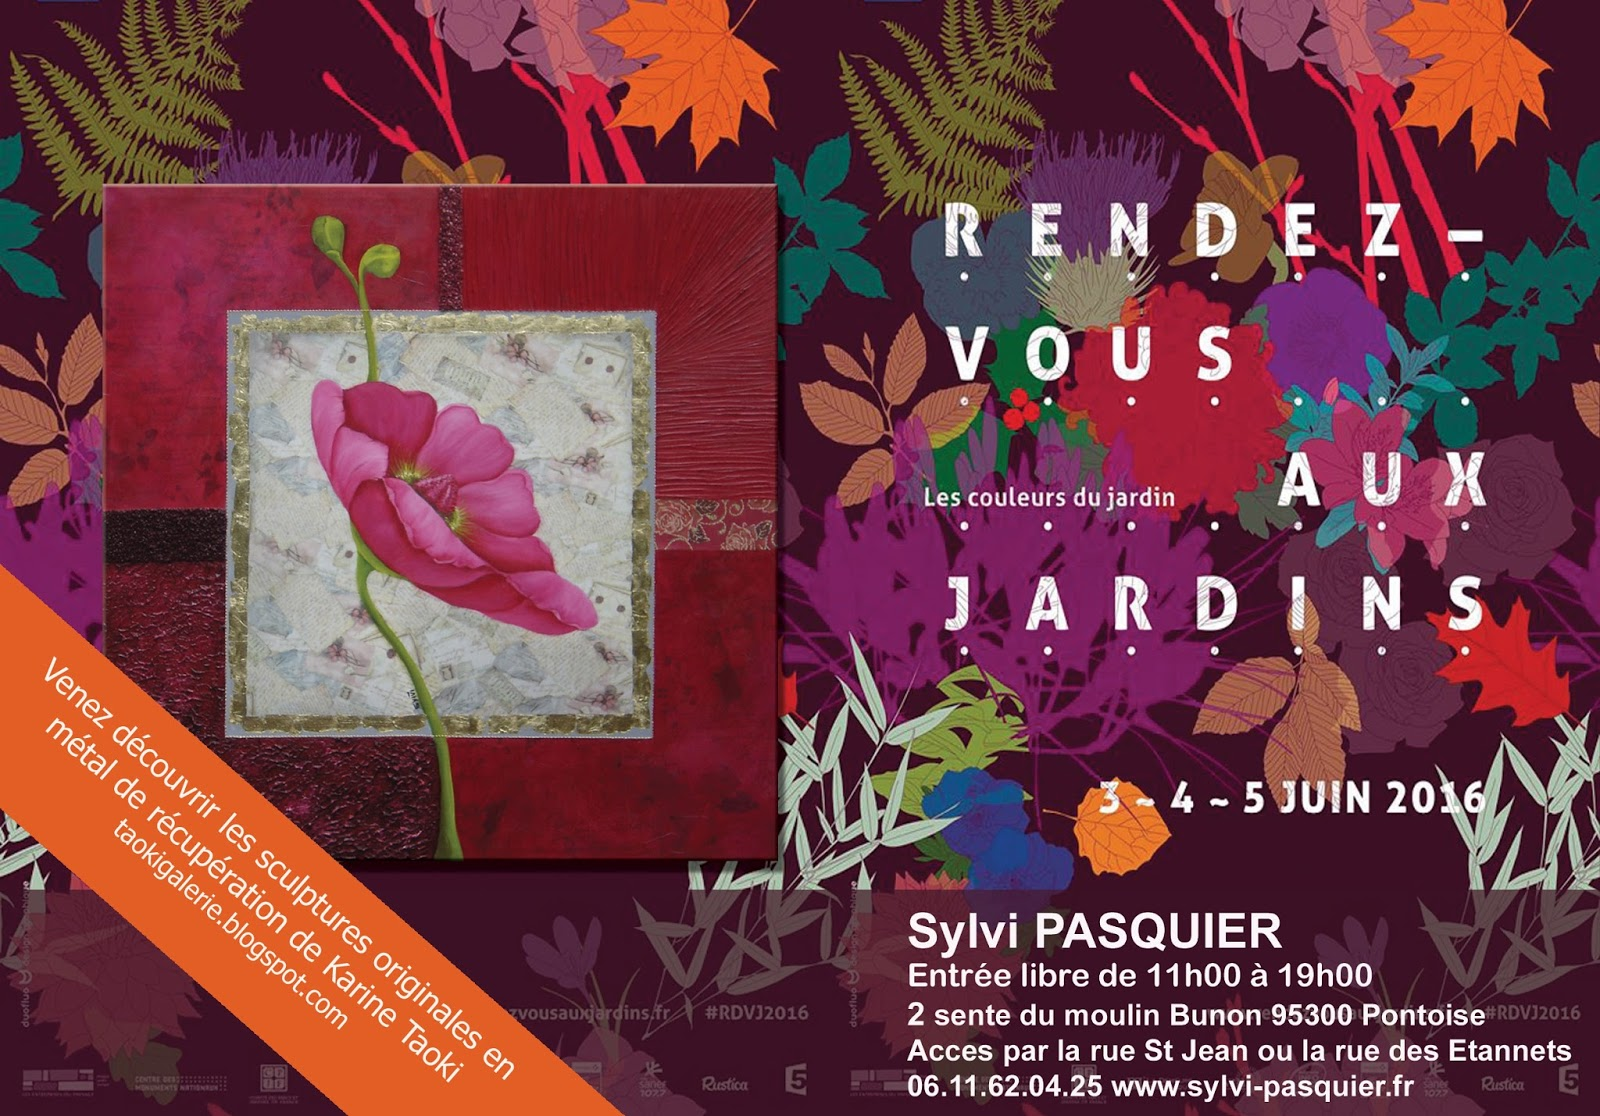 Karine taoki rendez vous au jardin 4 5 juin 2016 for Rendez vous au jardin 2016